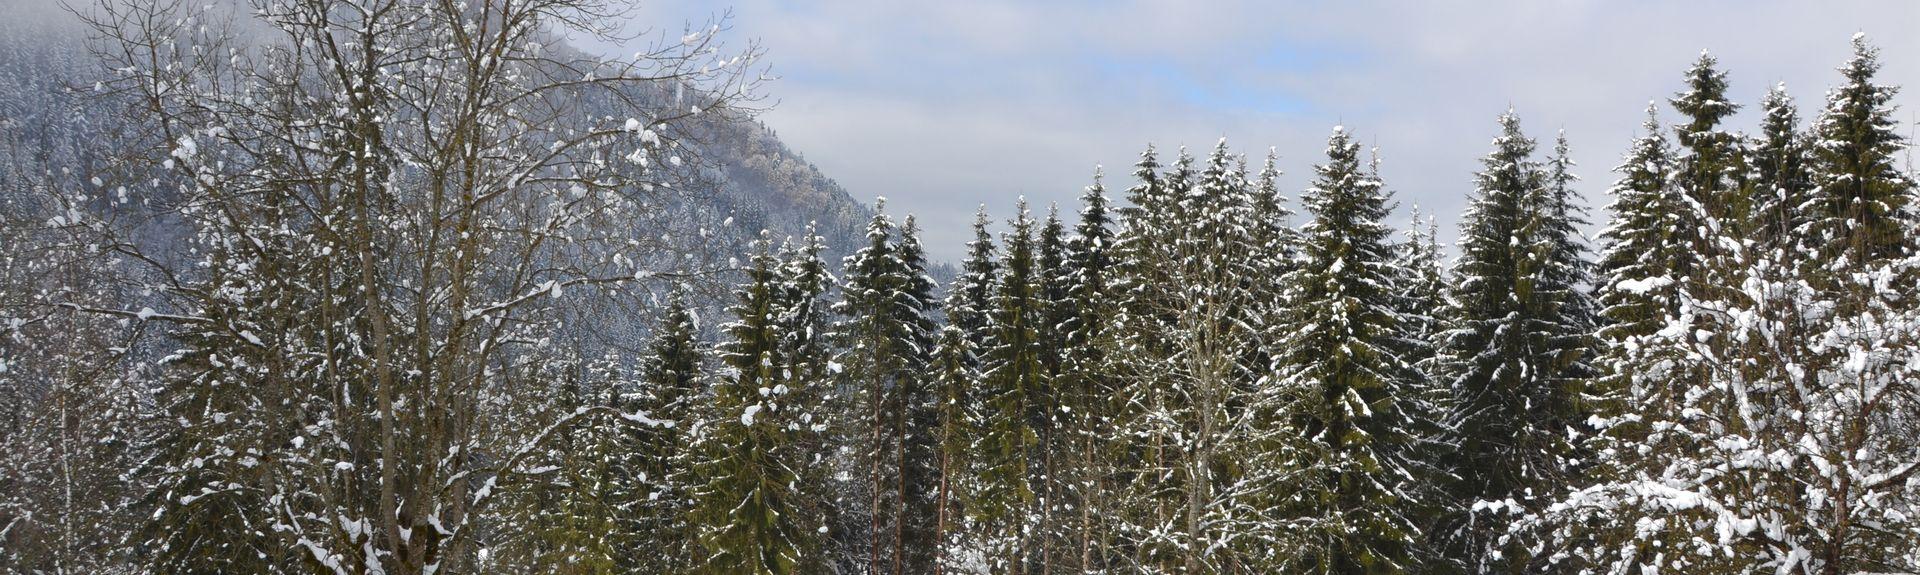 Weissenelf Ski Lift, Spital am Semmering, Styria, Austria